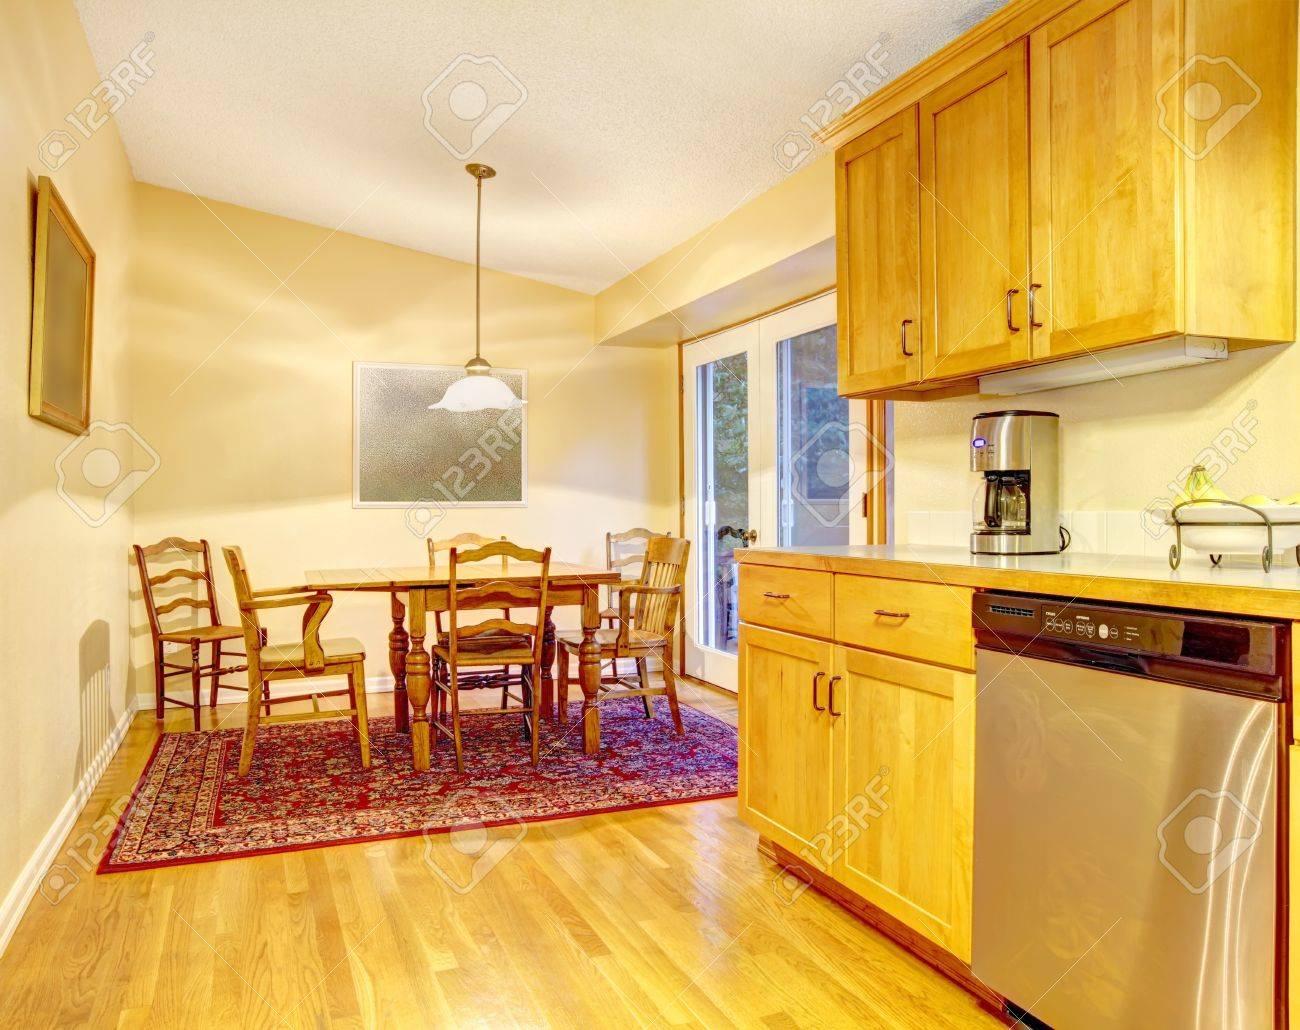 Eetkamer Van Oranje : Keuken in oranje warme kleuren en eetkamer royalty vrije foto